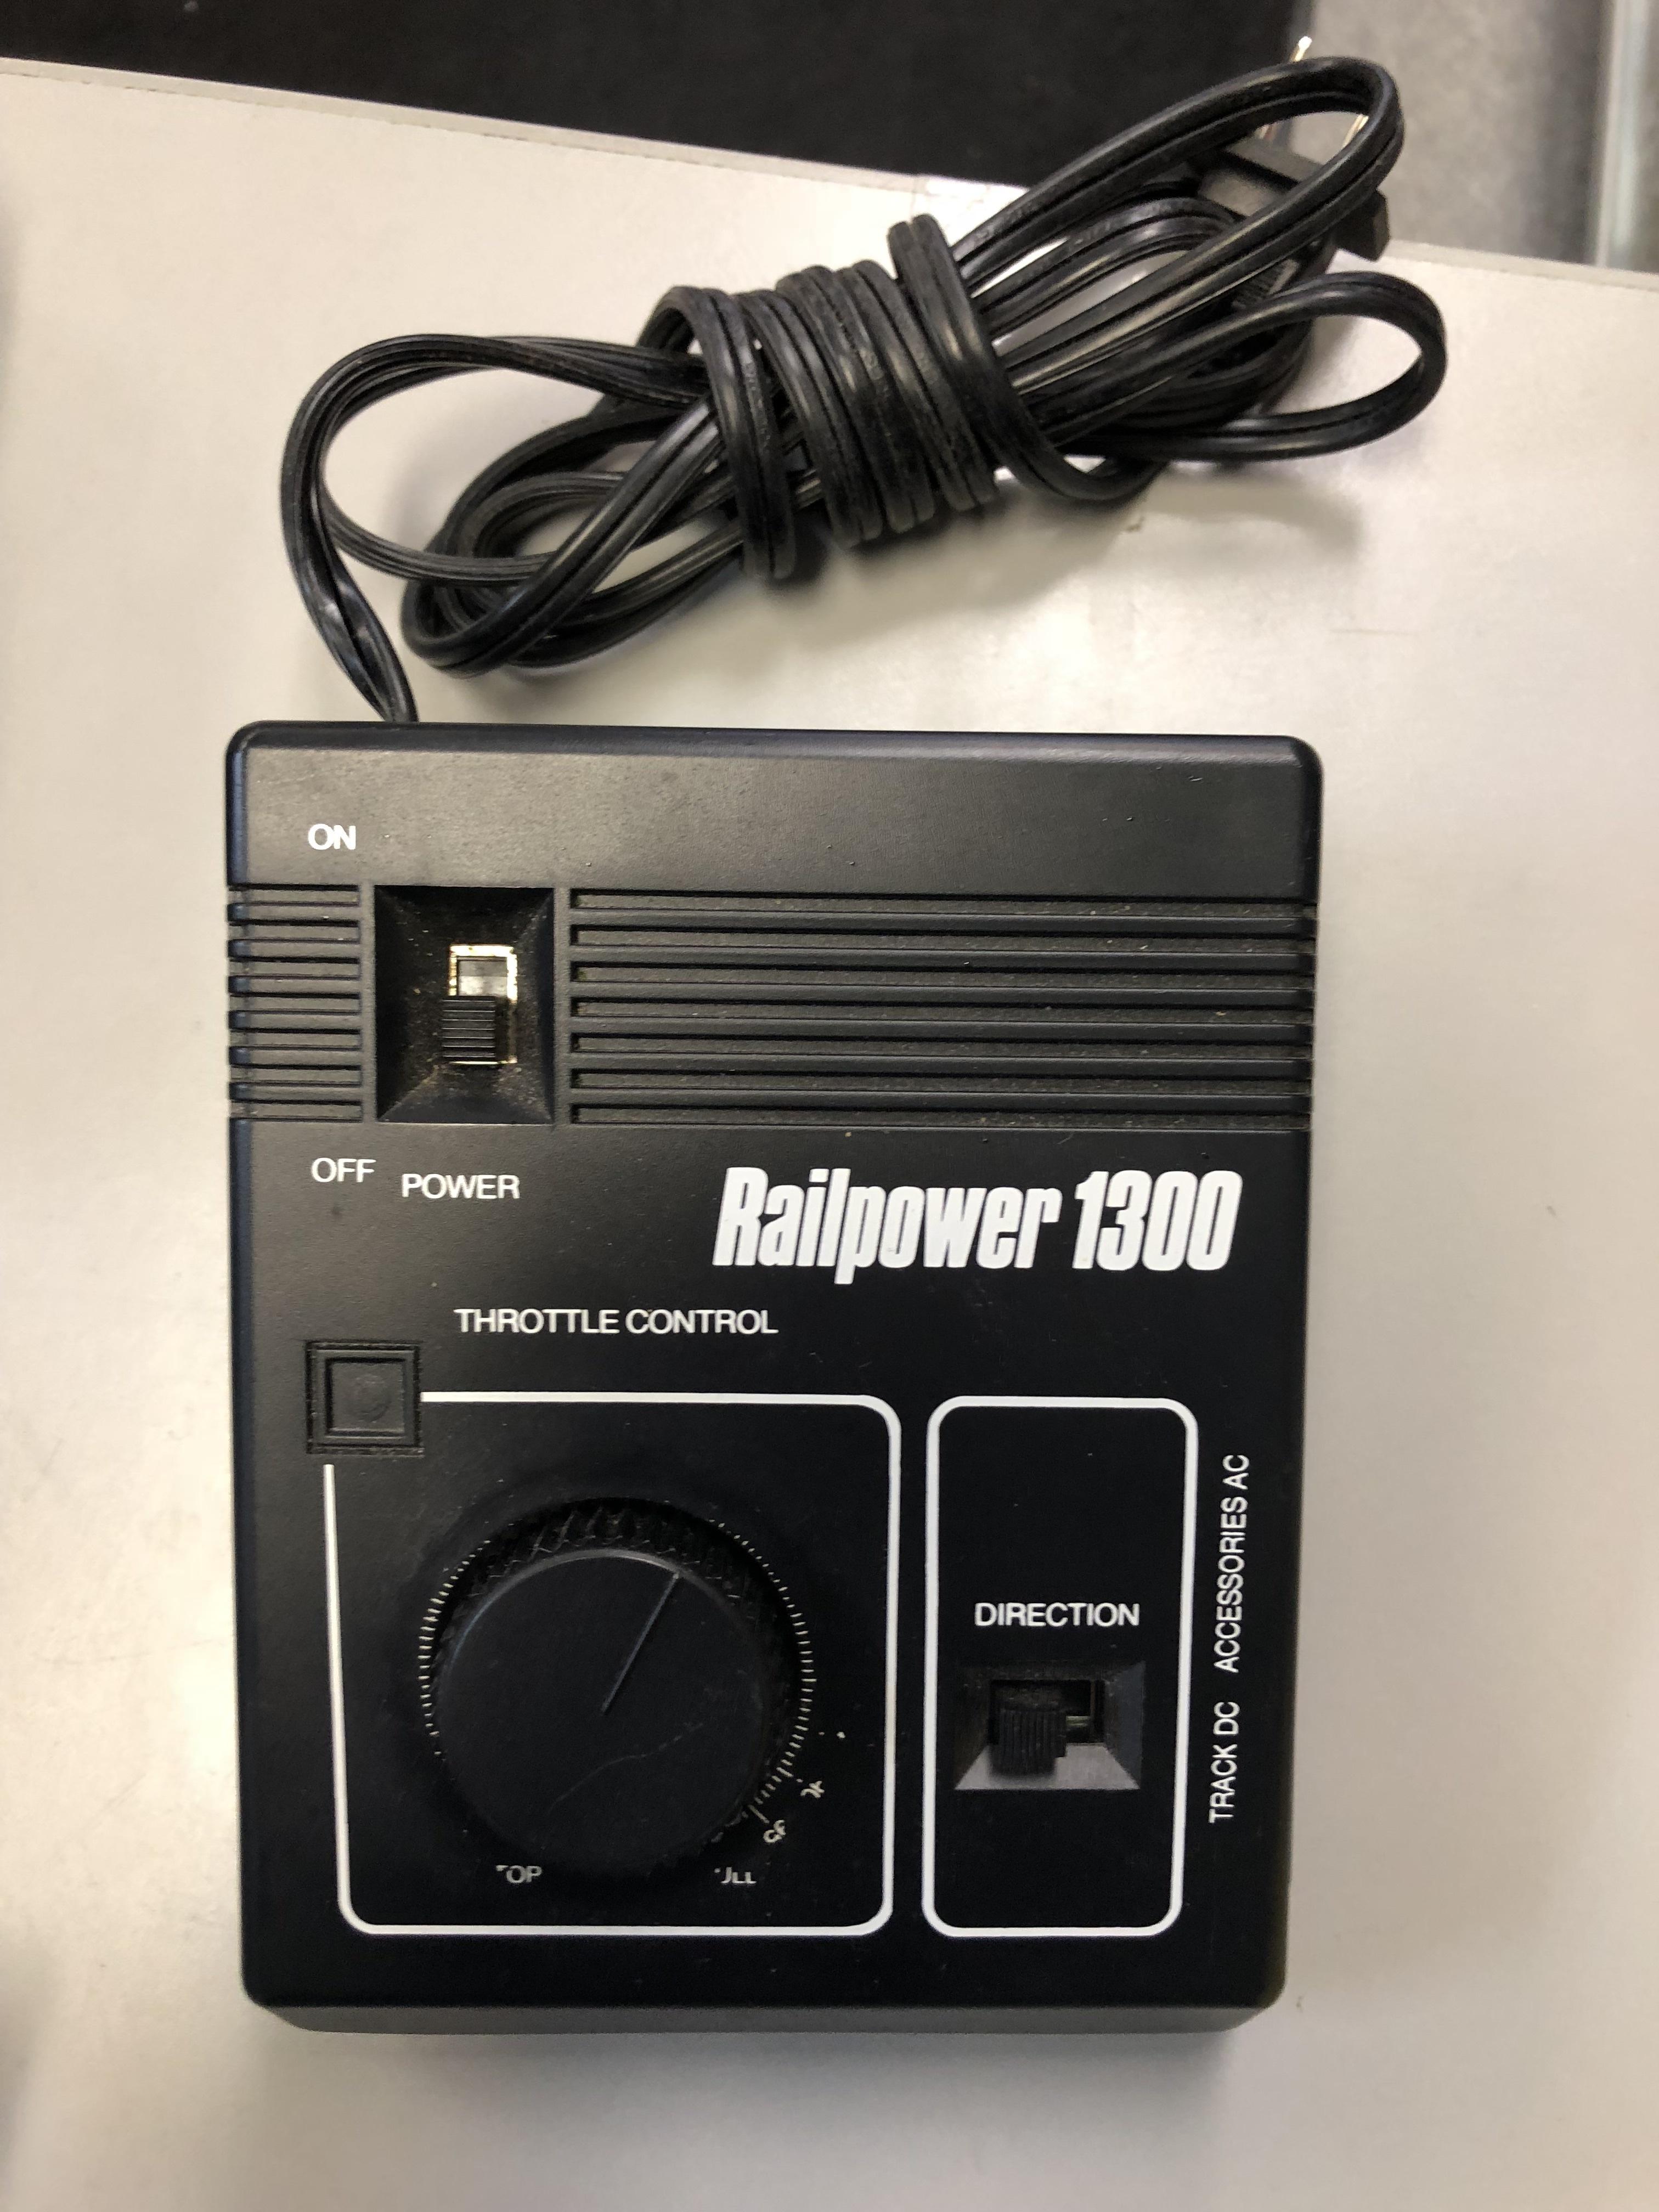 Railpower 1300